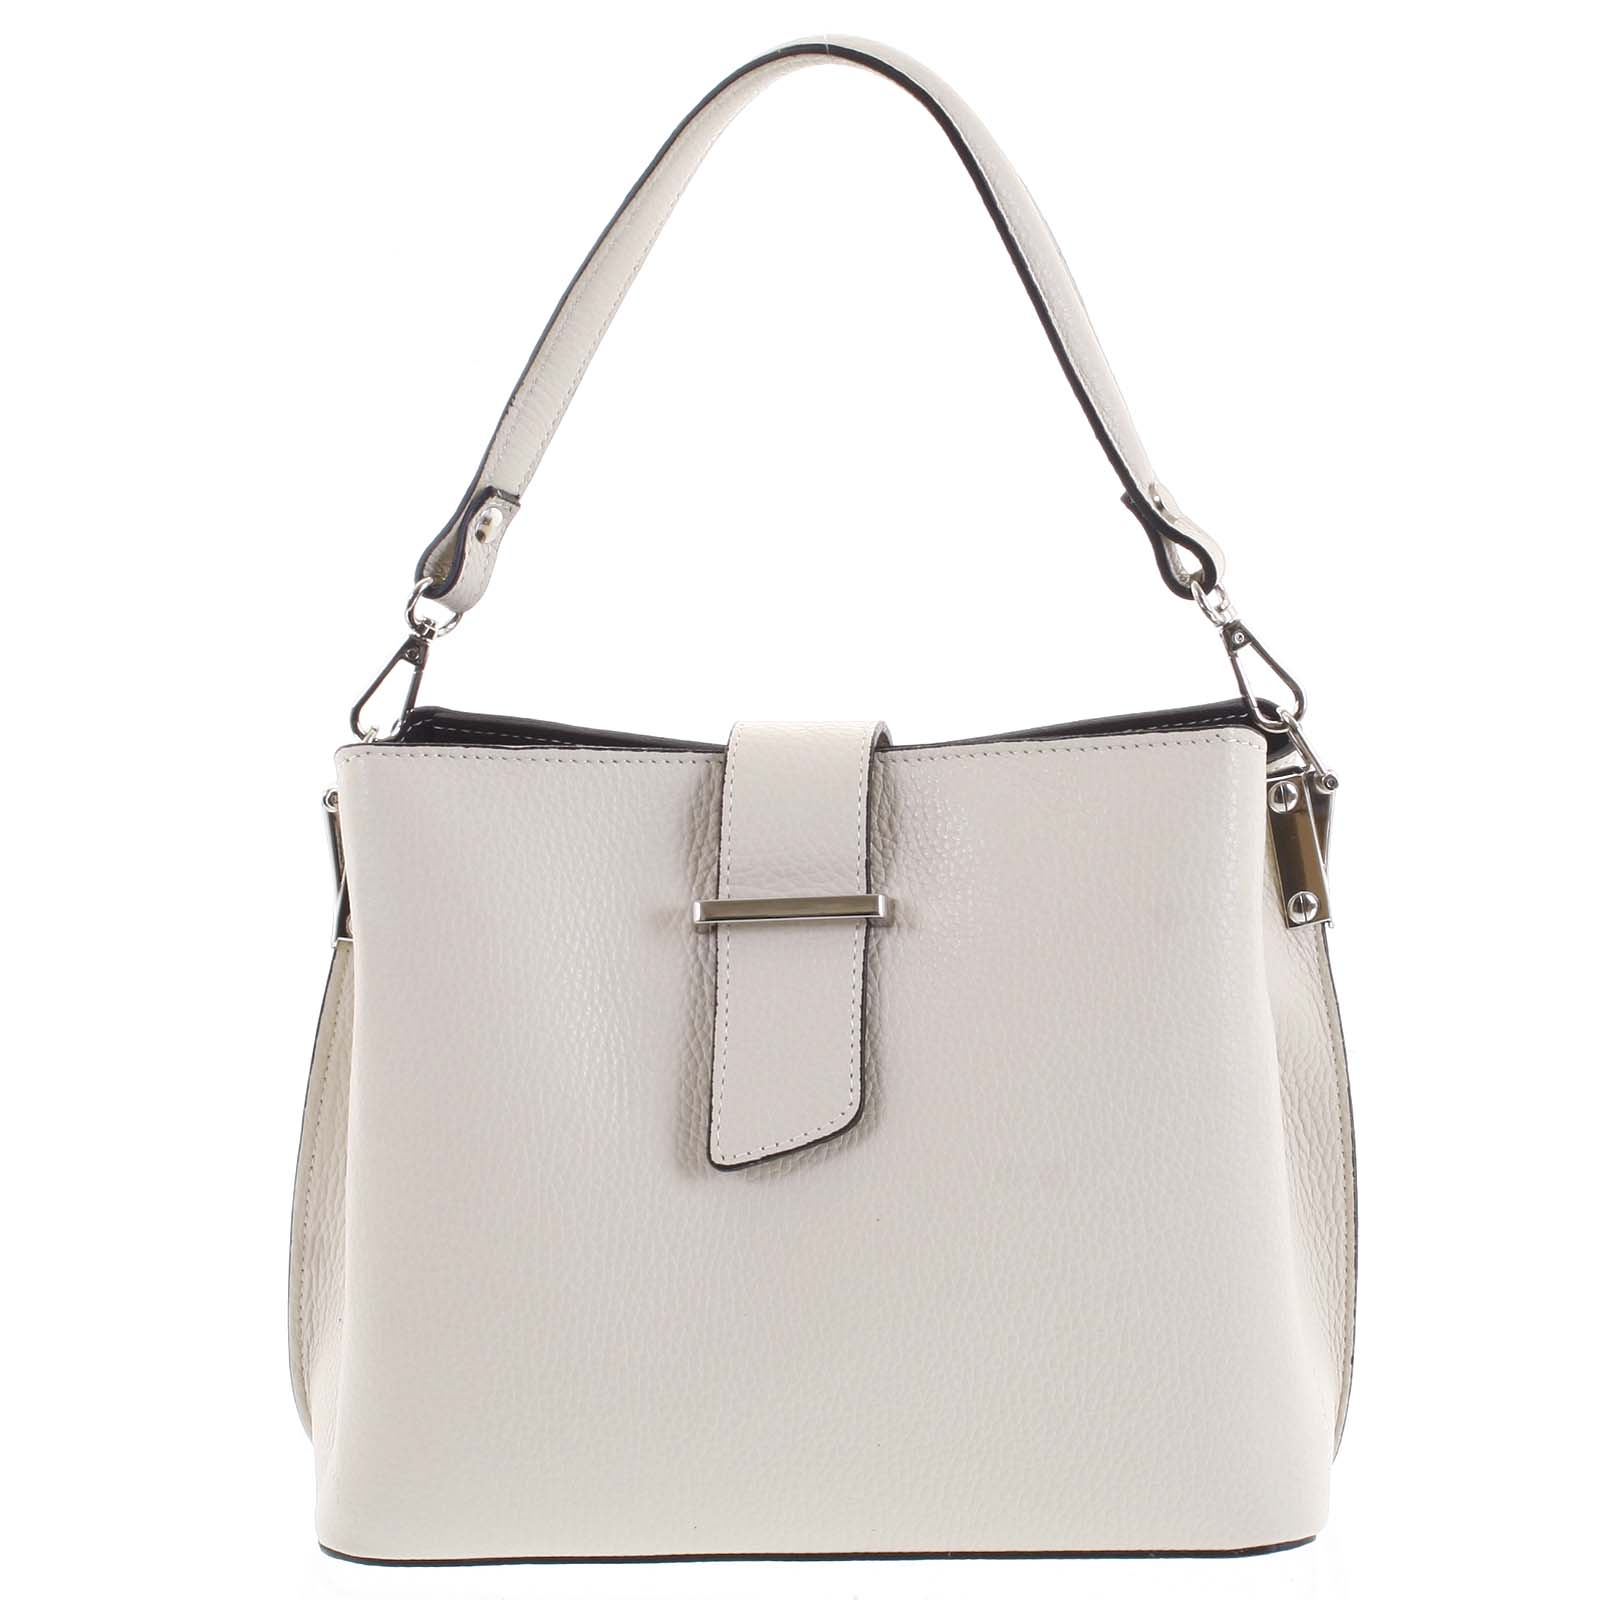 Dámska kožená kabelka do ruky béžová - ItalY Auren